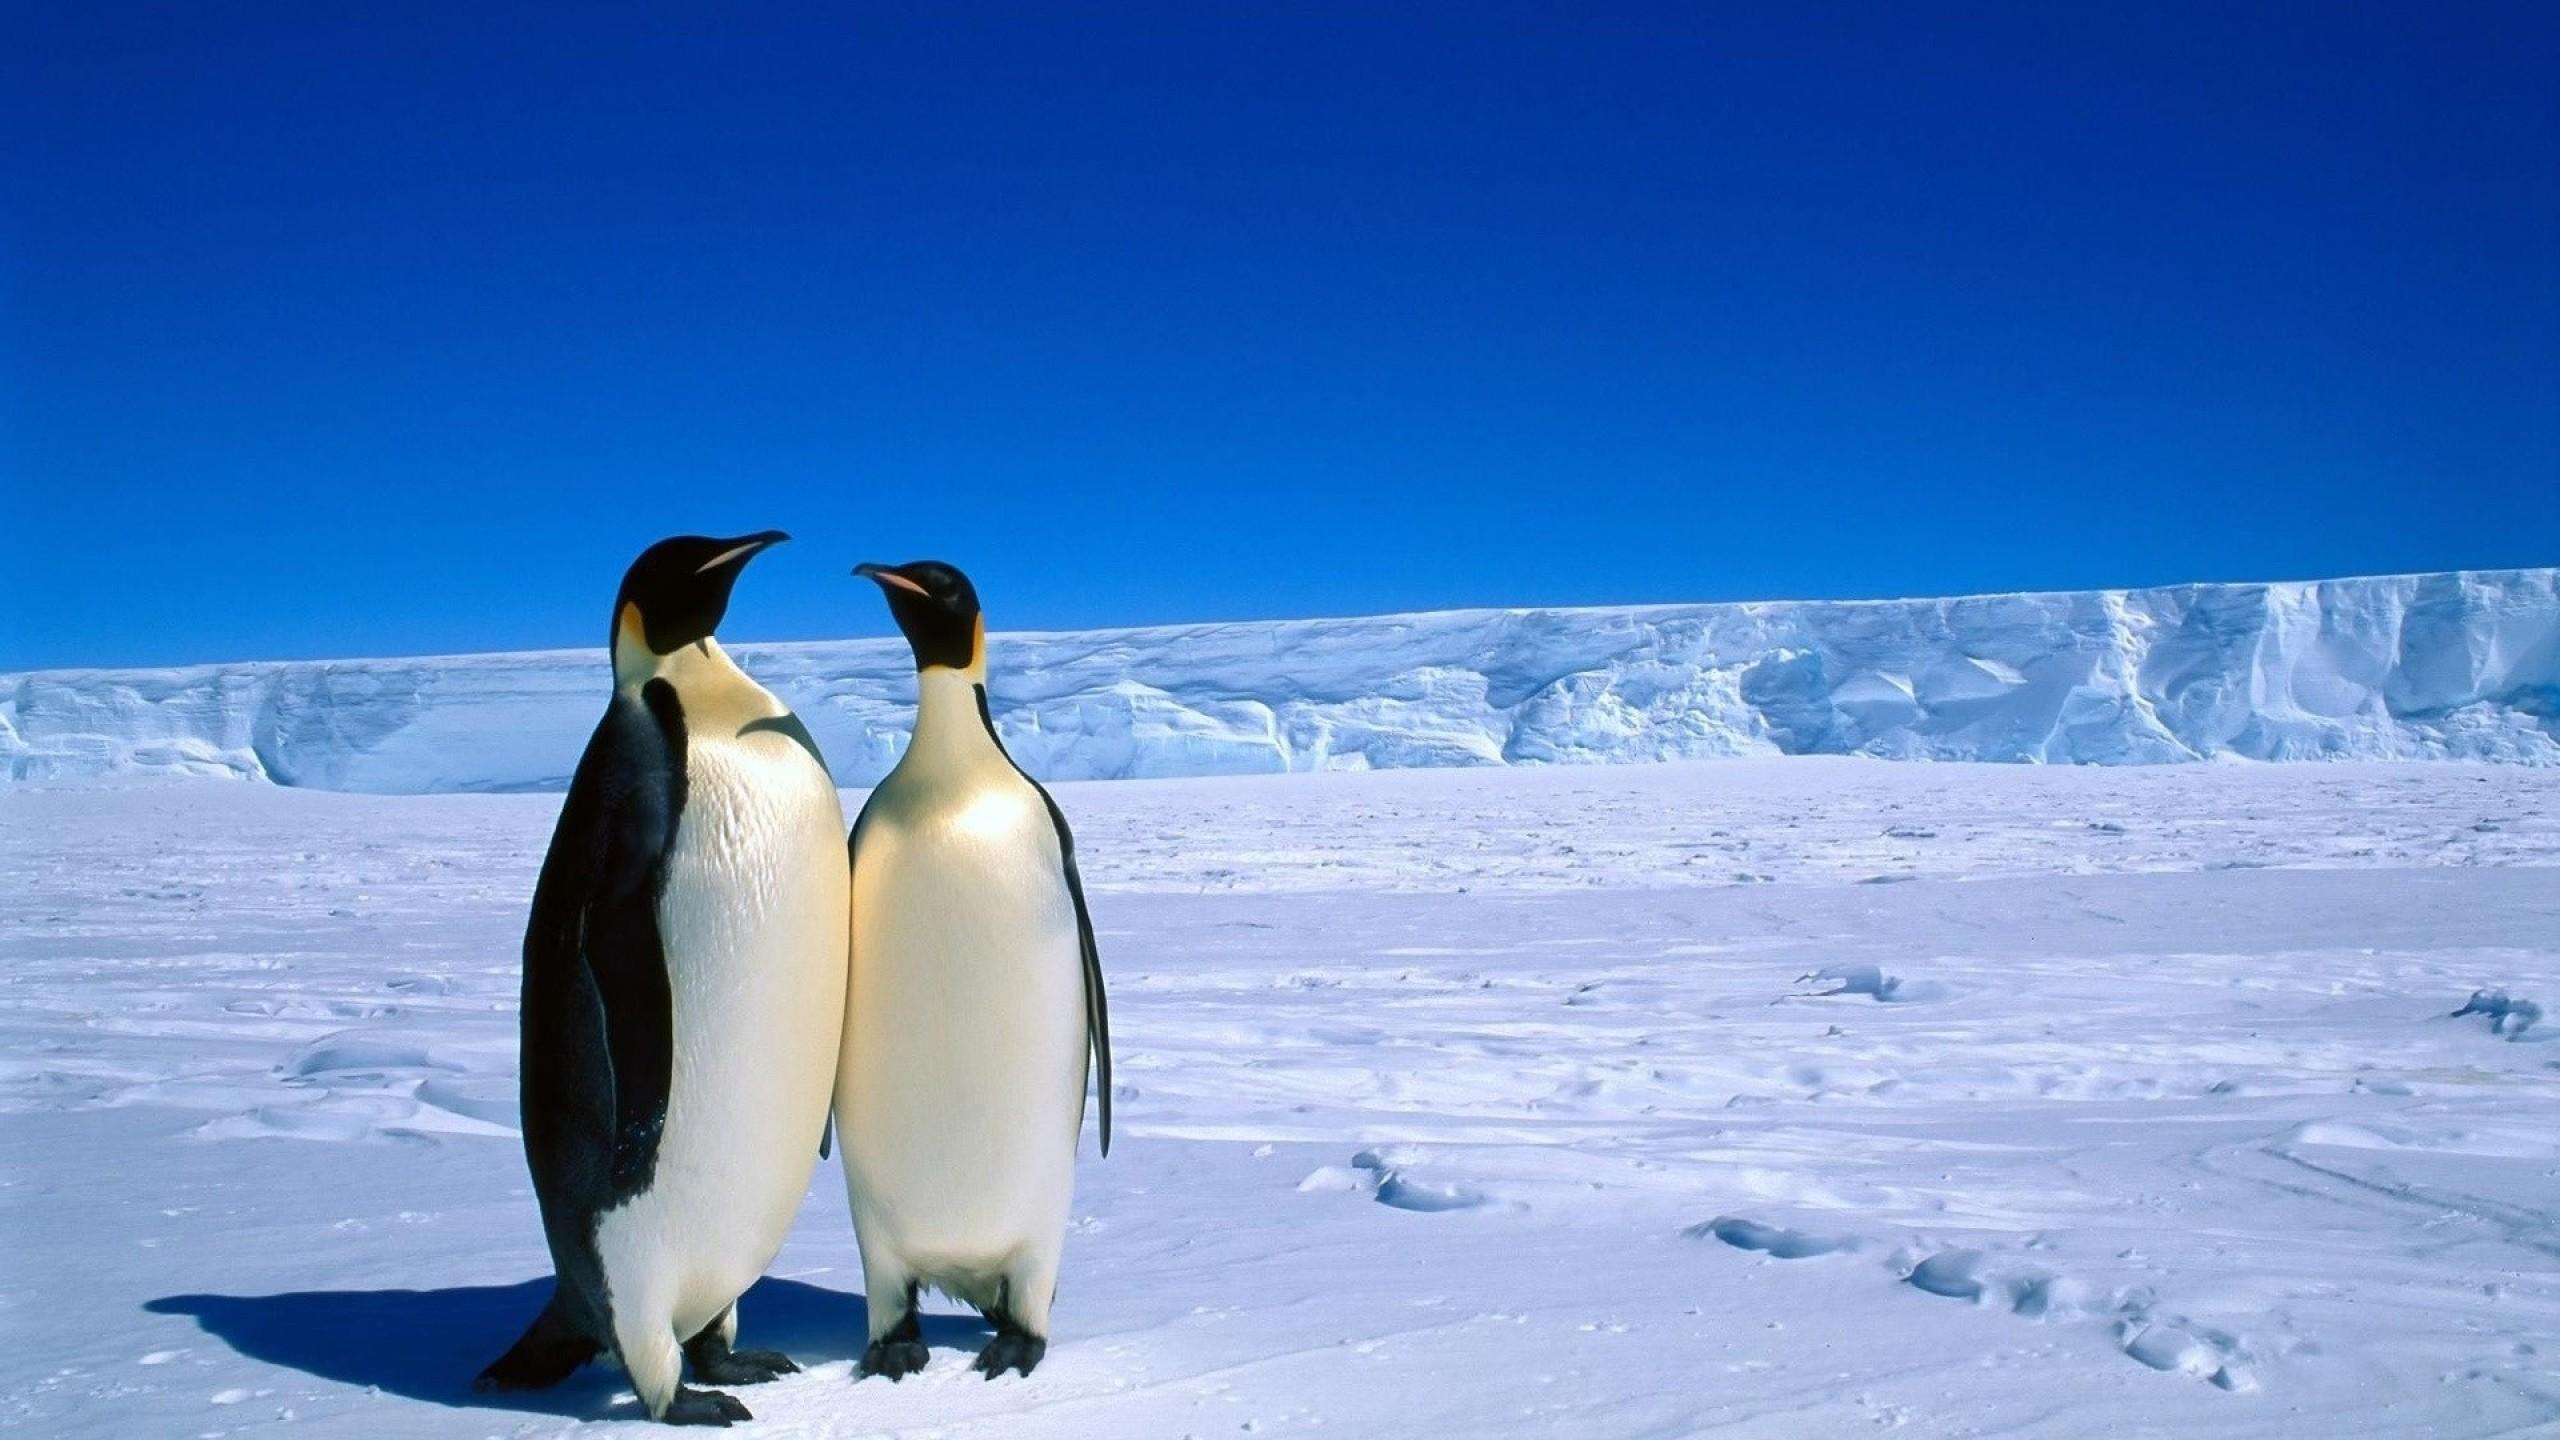 Antarctica clipart #10, Download drawings